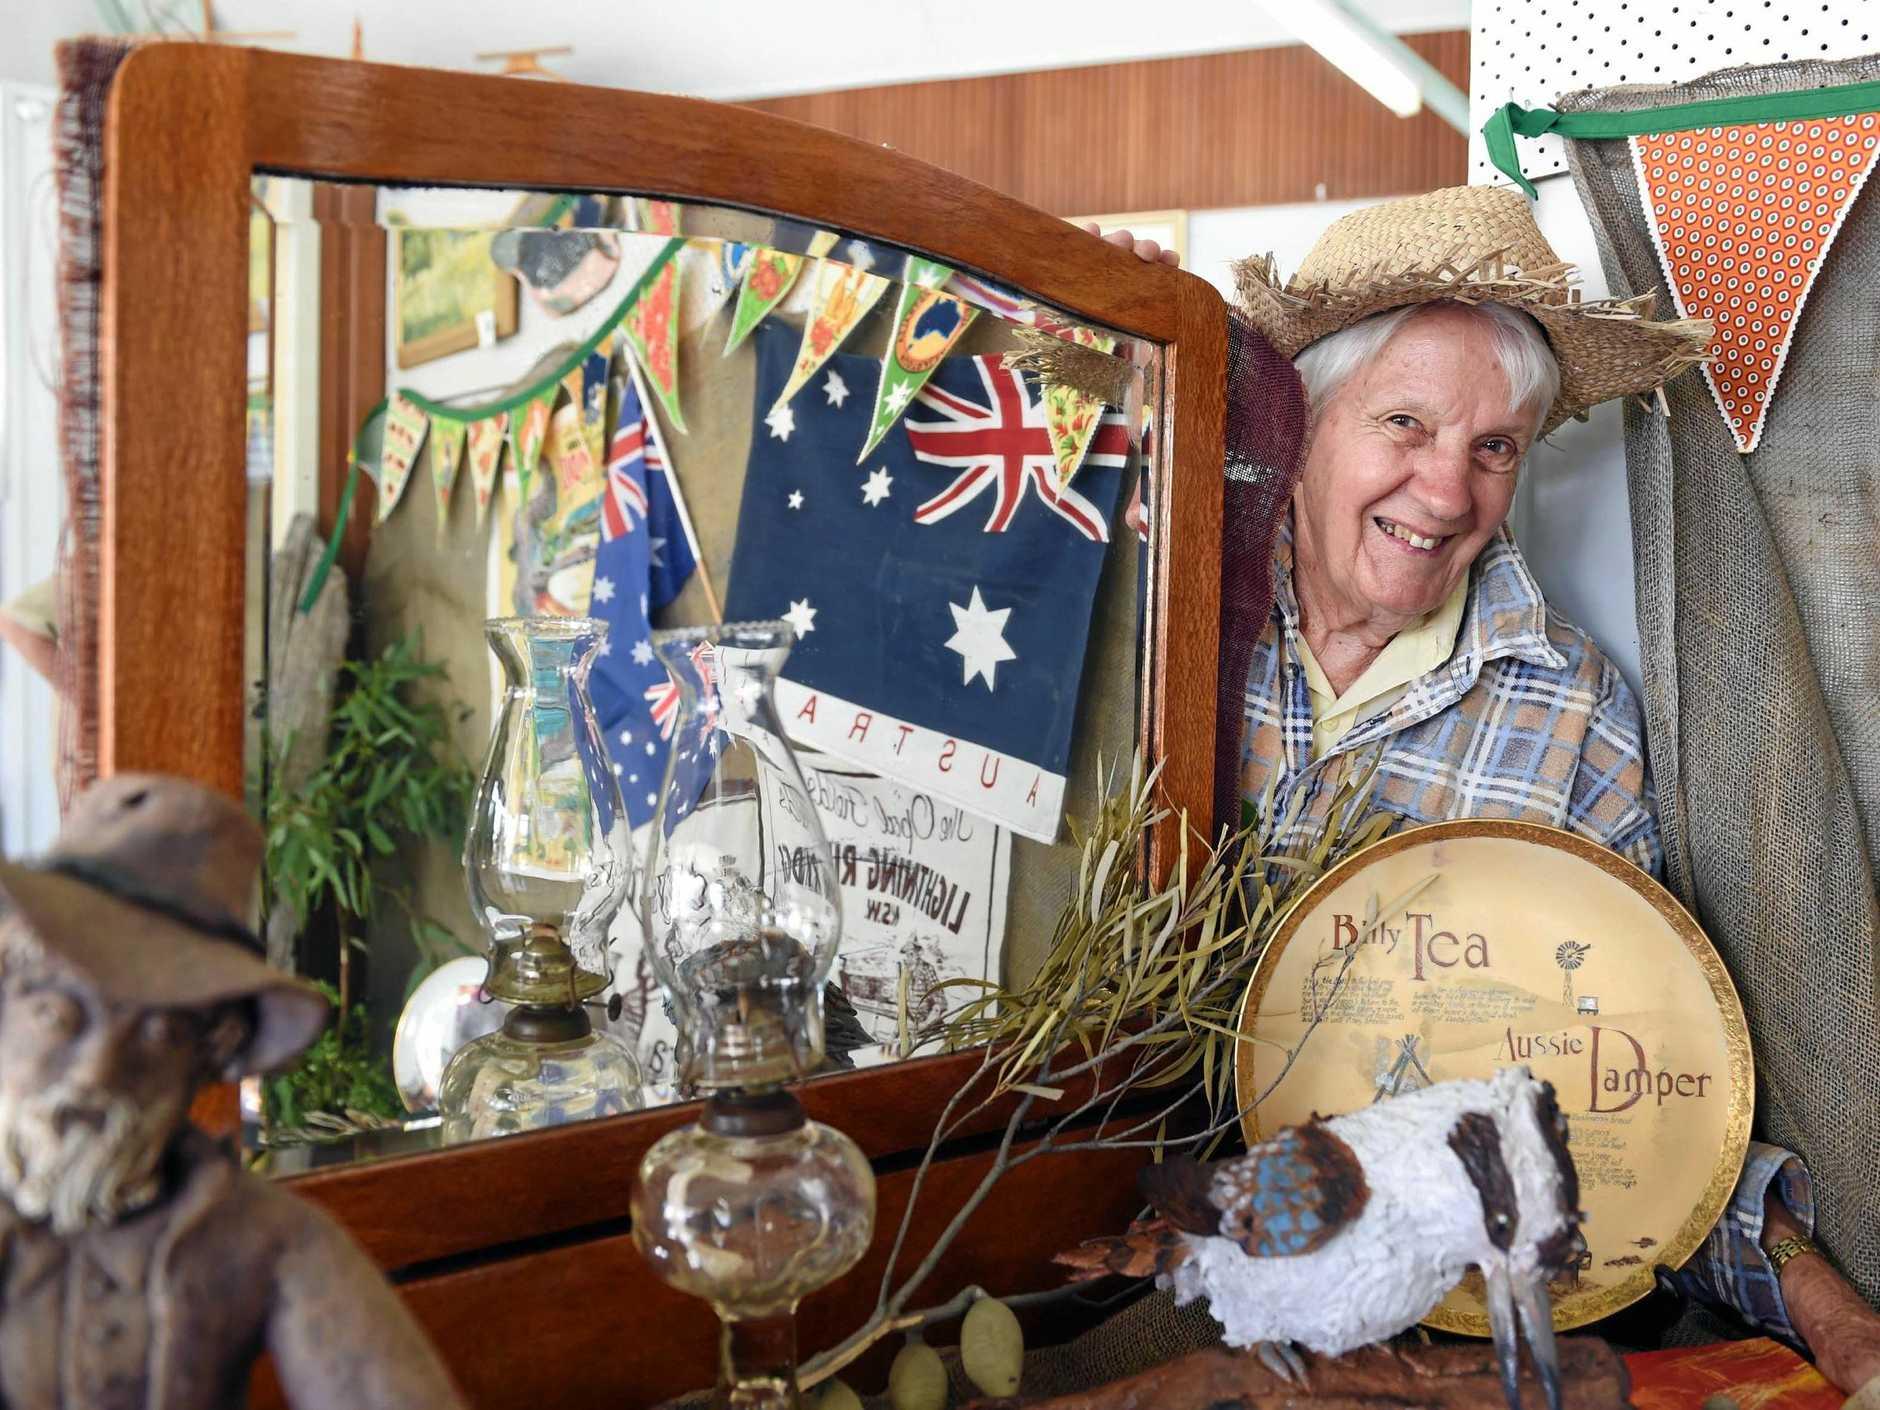 Julie Wight in the Bottlebrush Crafts' Australia Day display.